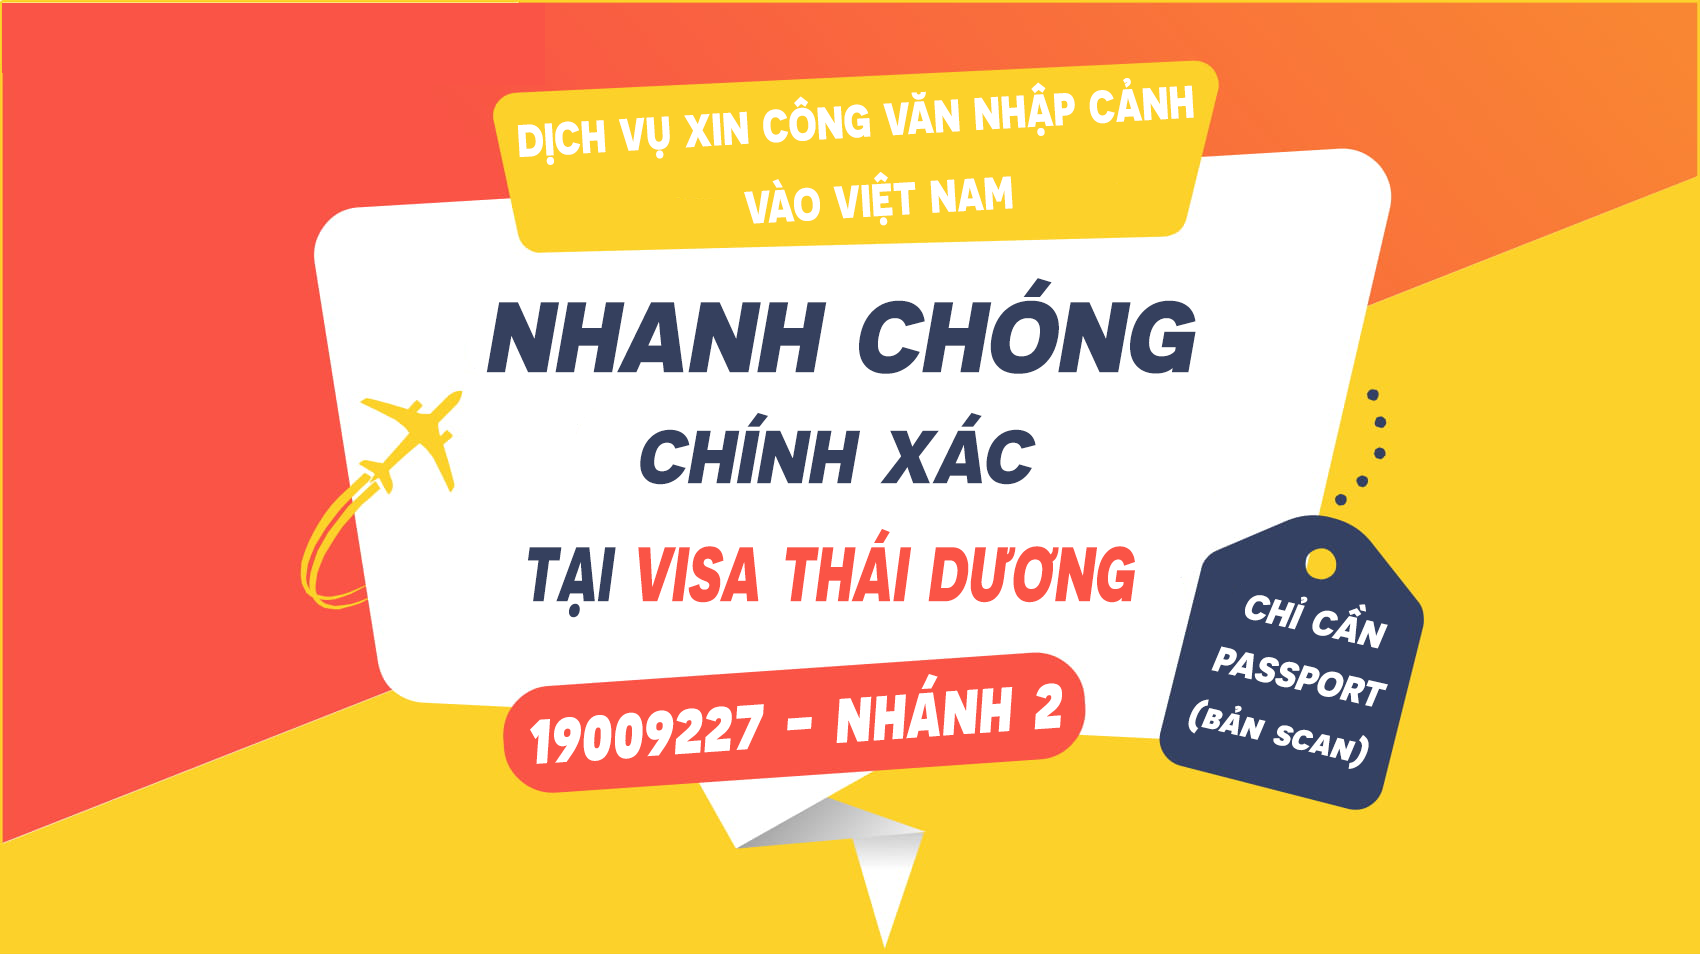 Xin_Cong_Van_Nhap_Canh